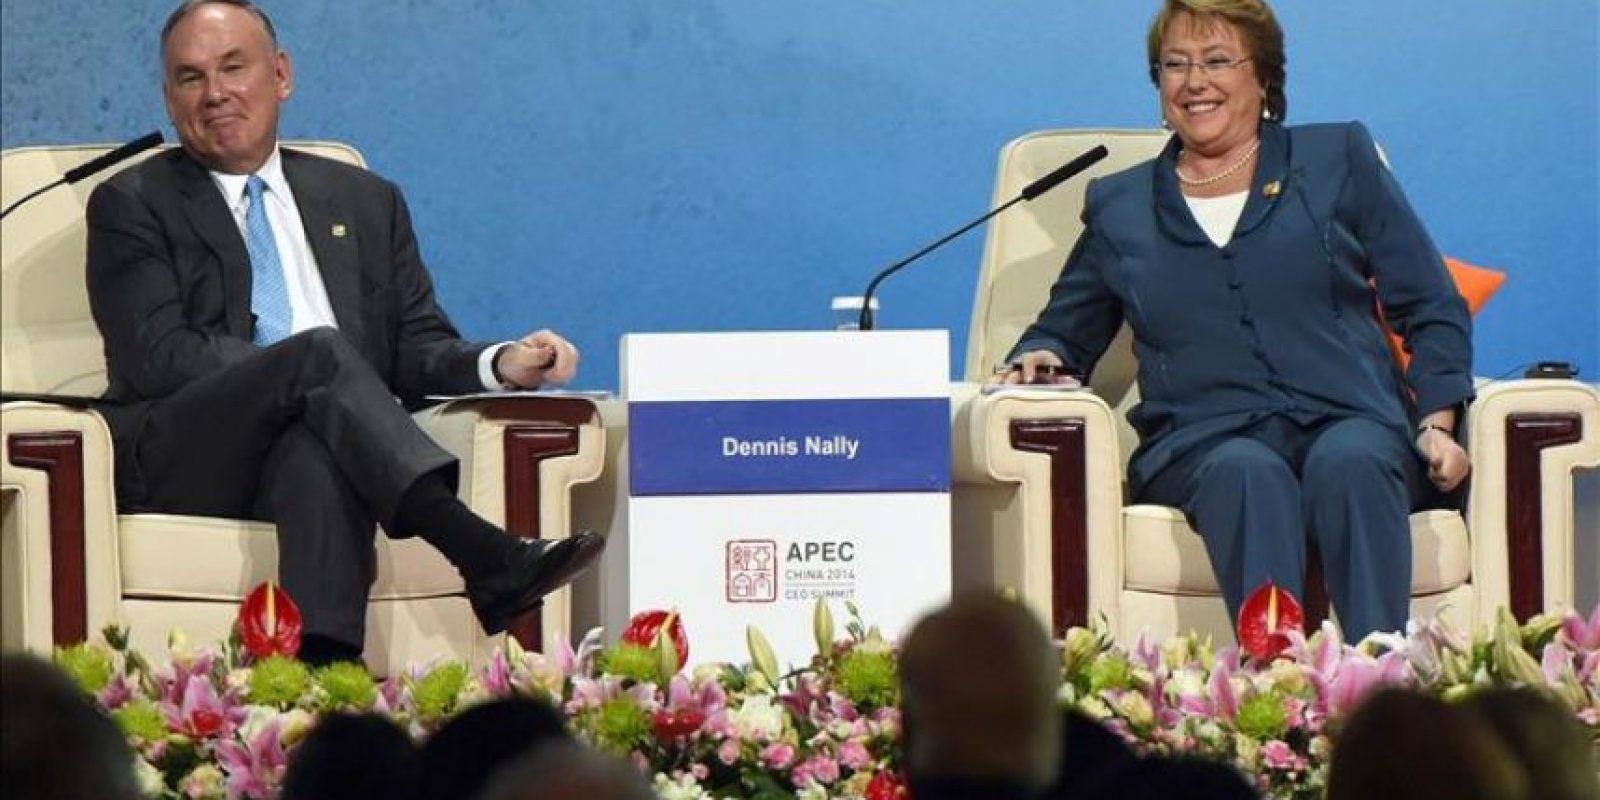 La presidenta de Chile, Michelle Bachelet (dcha) junto a Dennis Nally (izda), de Pricewaterhouse-Coopers International, en la cumbre de la APEC. EFE